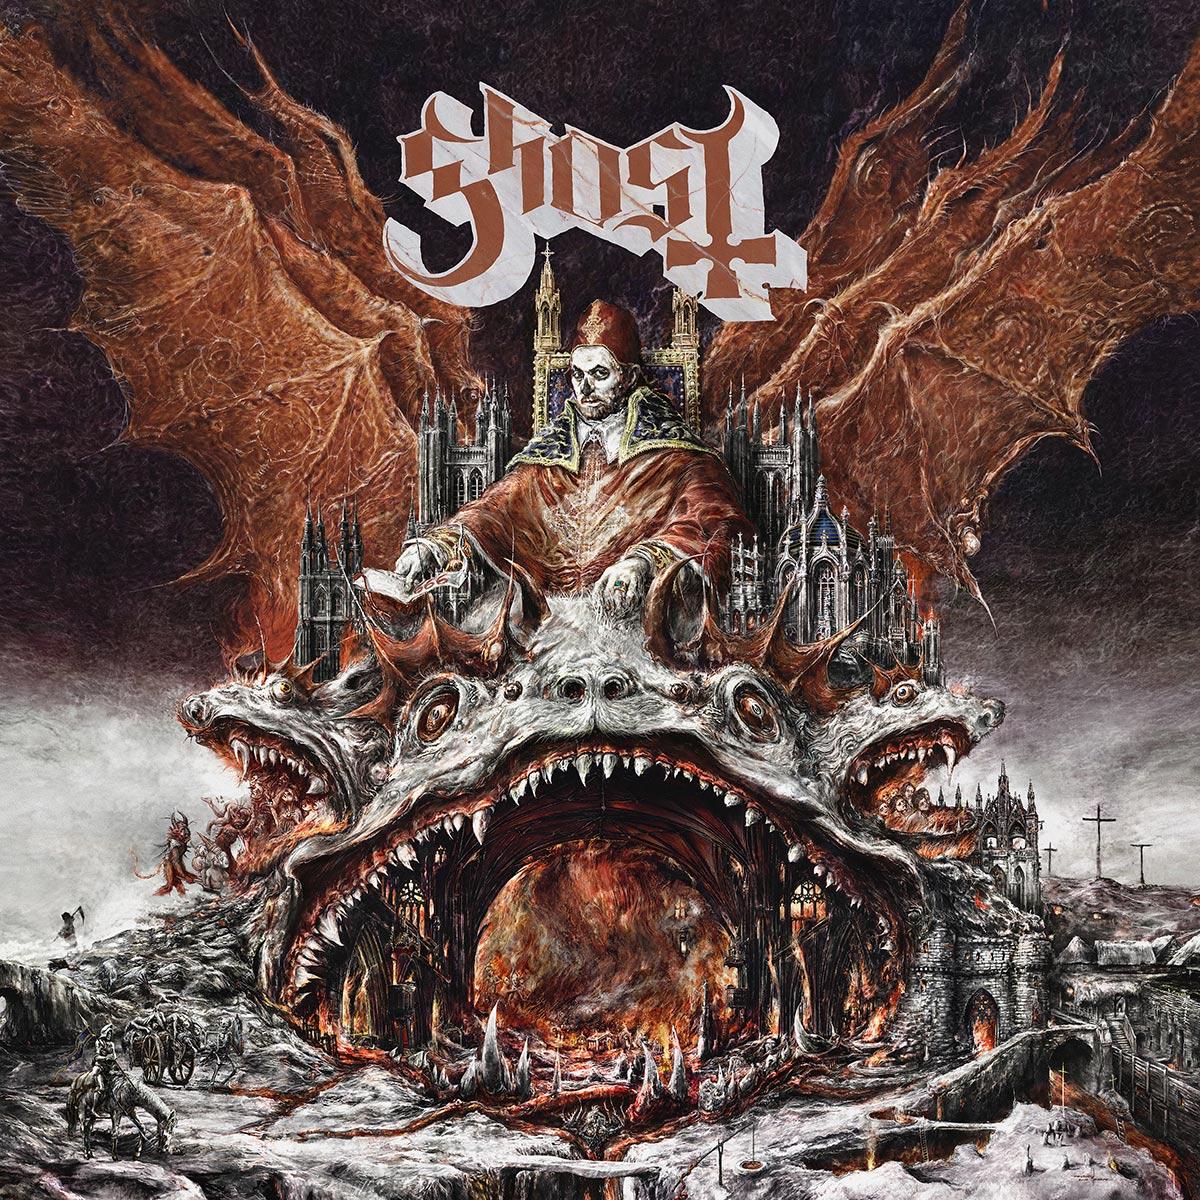 ghost prequelle new album Ghost announce new album, Prequelle, share Rats video: Watch